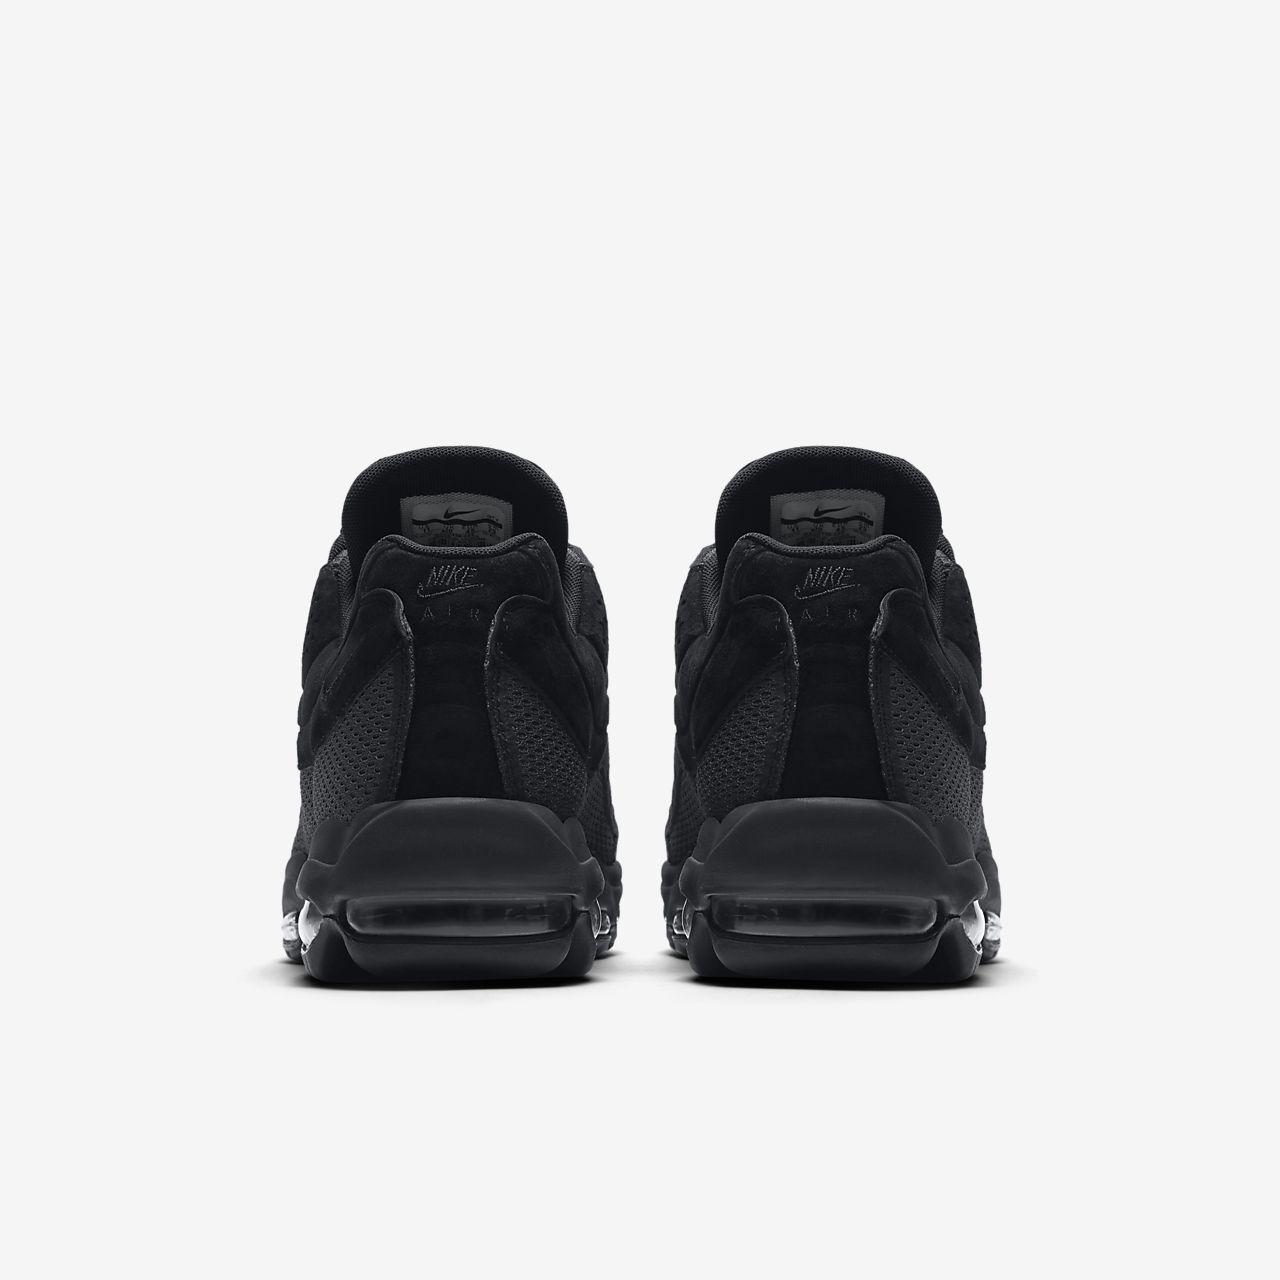 Nike Air Max 95 Ultra Premium Premium Premium BR Herrenschuh Sparen Sie über 50%-AR1843DS   ce4027